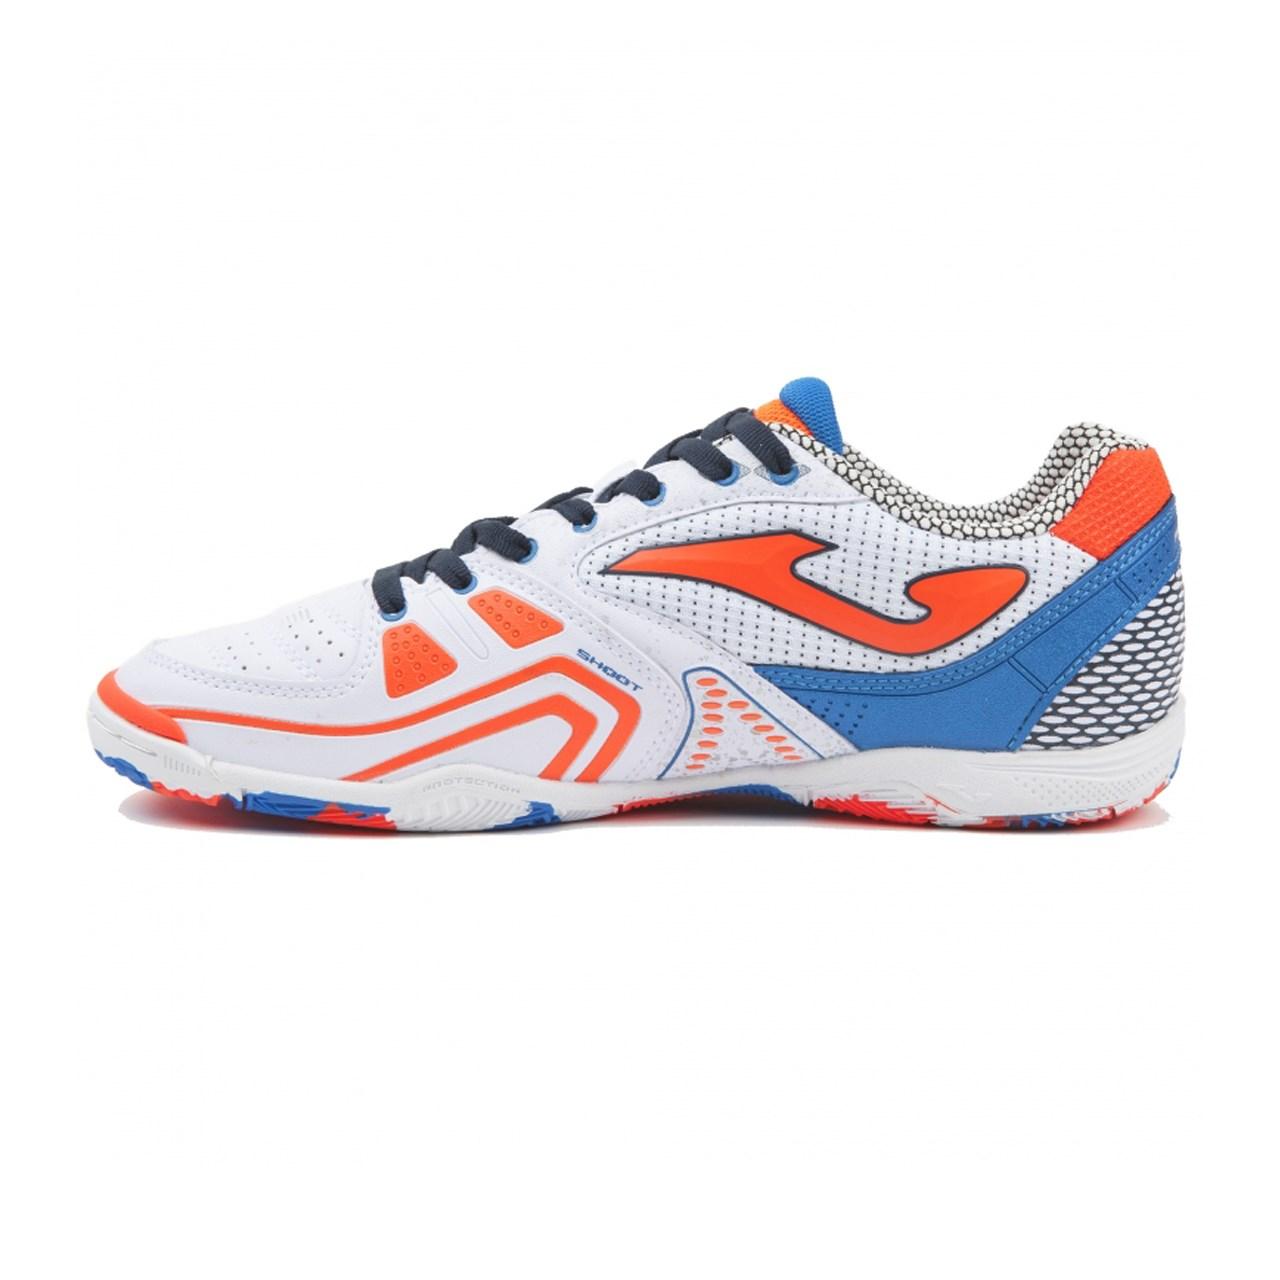 کفش فوتسال مردانه جوما مدل DRIBLING 802